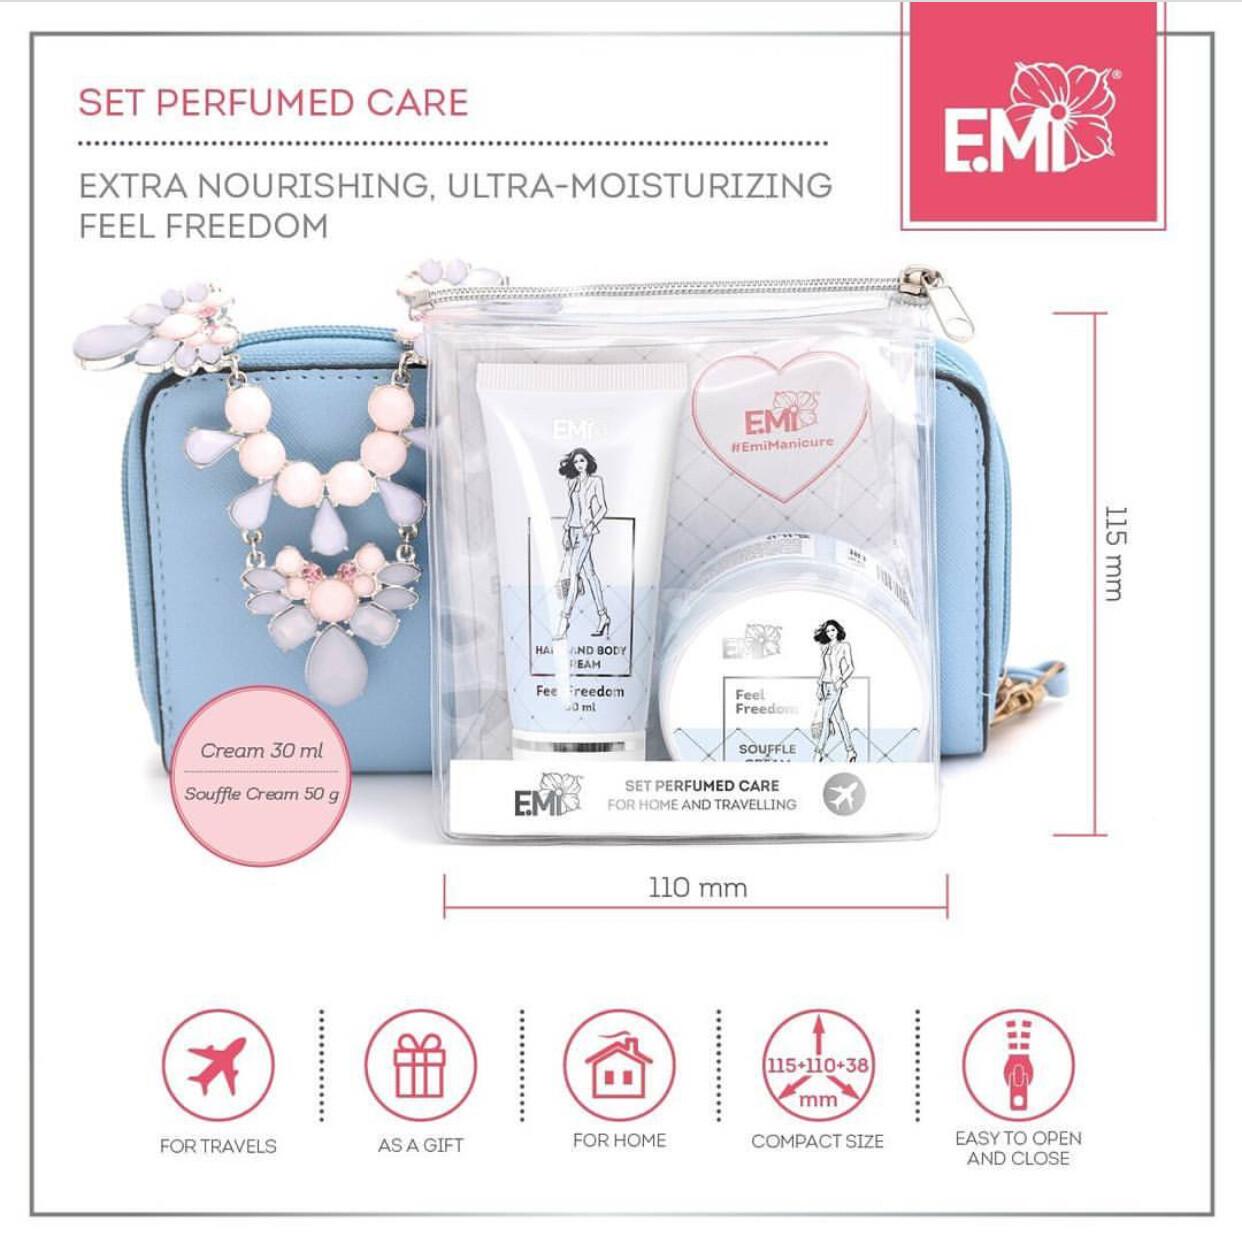 Set Perfumed Care. Extra-Nourishment and Ultra-Moisturizing Feel Freedom